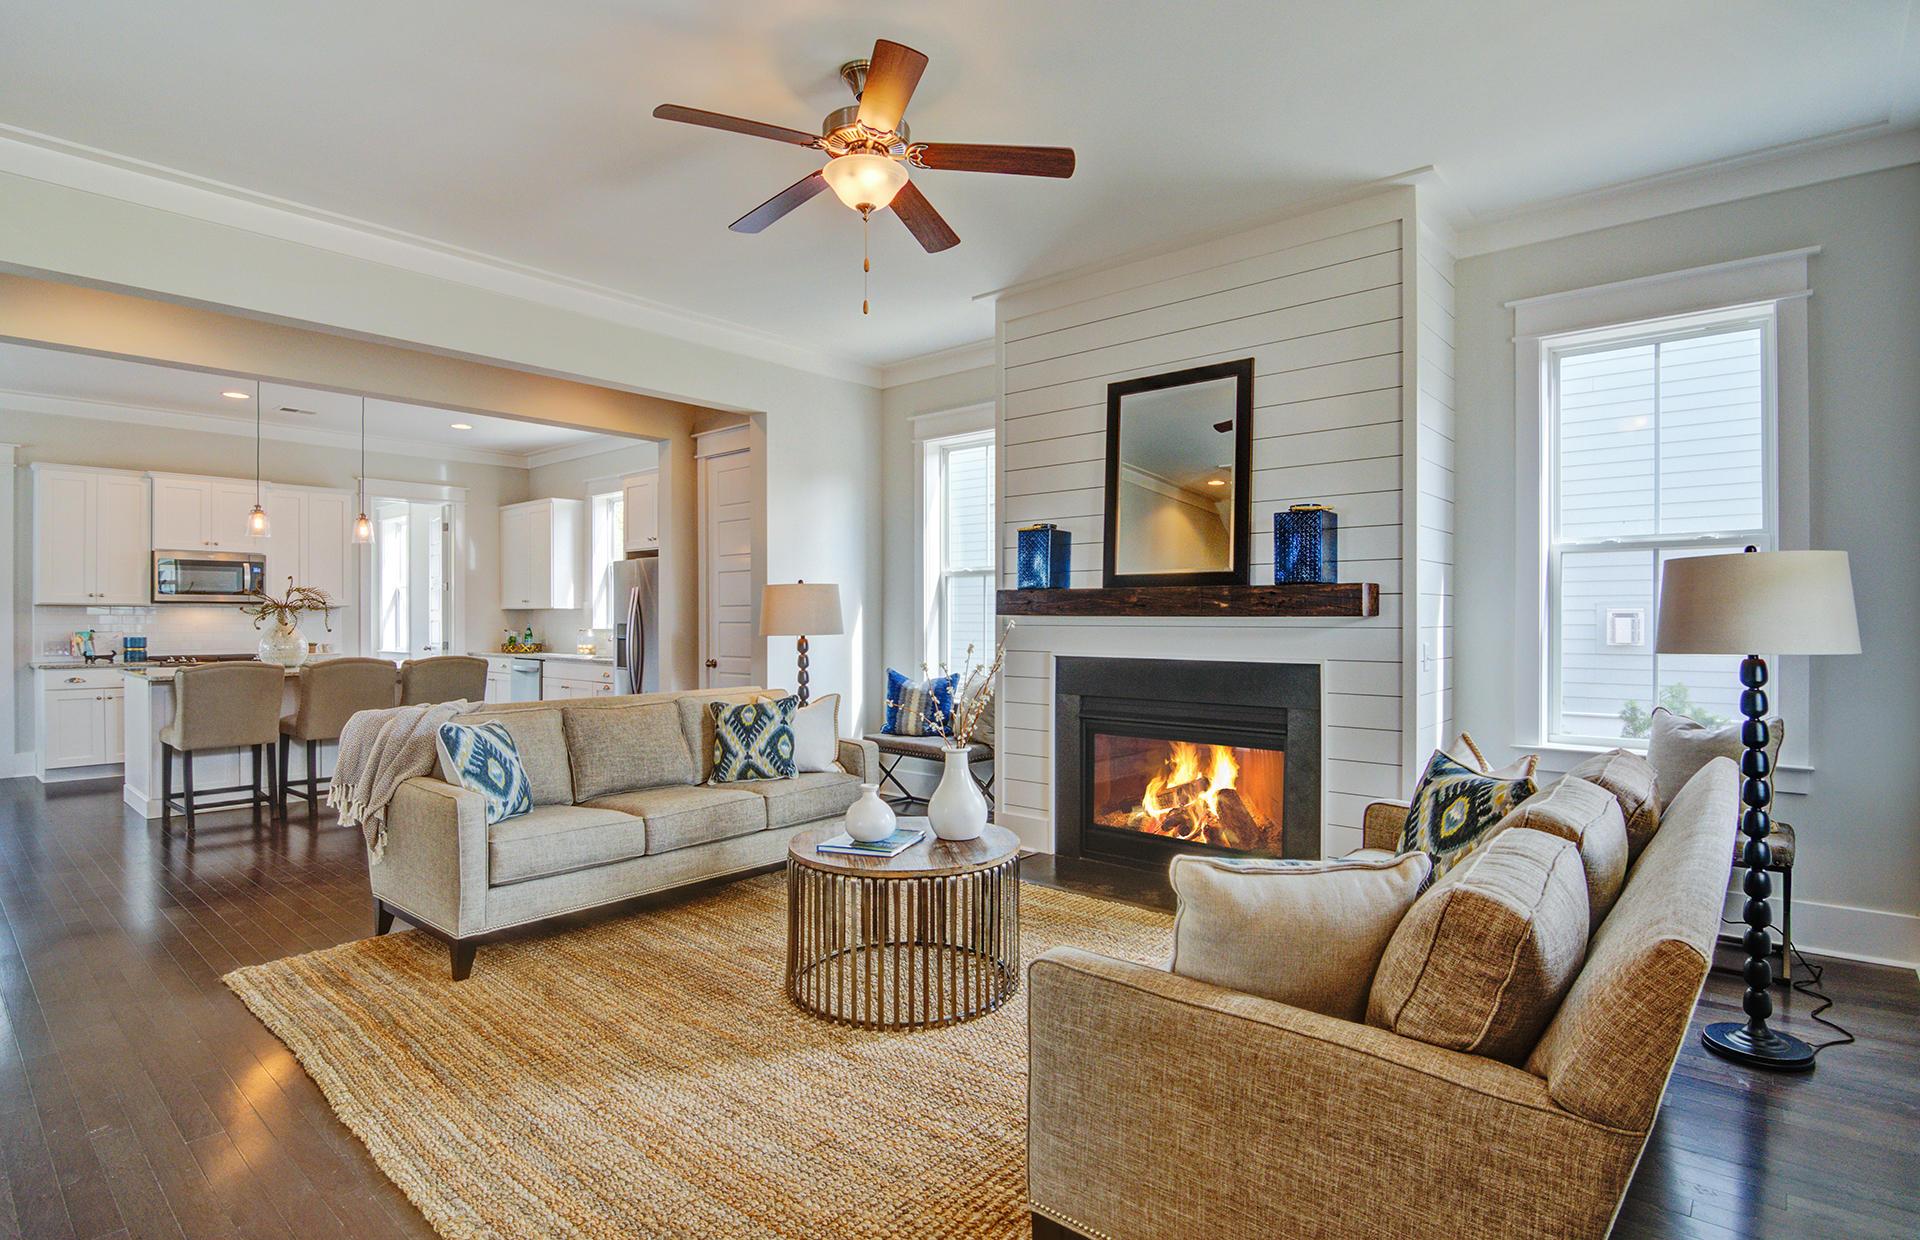 Carolina Park Homes For Sale - 3582 Backshore, Mount Pleasant, SC - 39